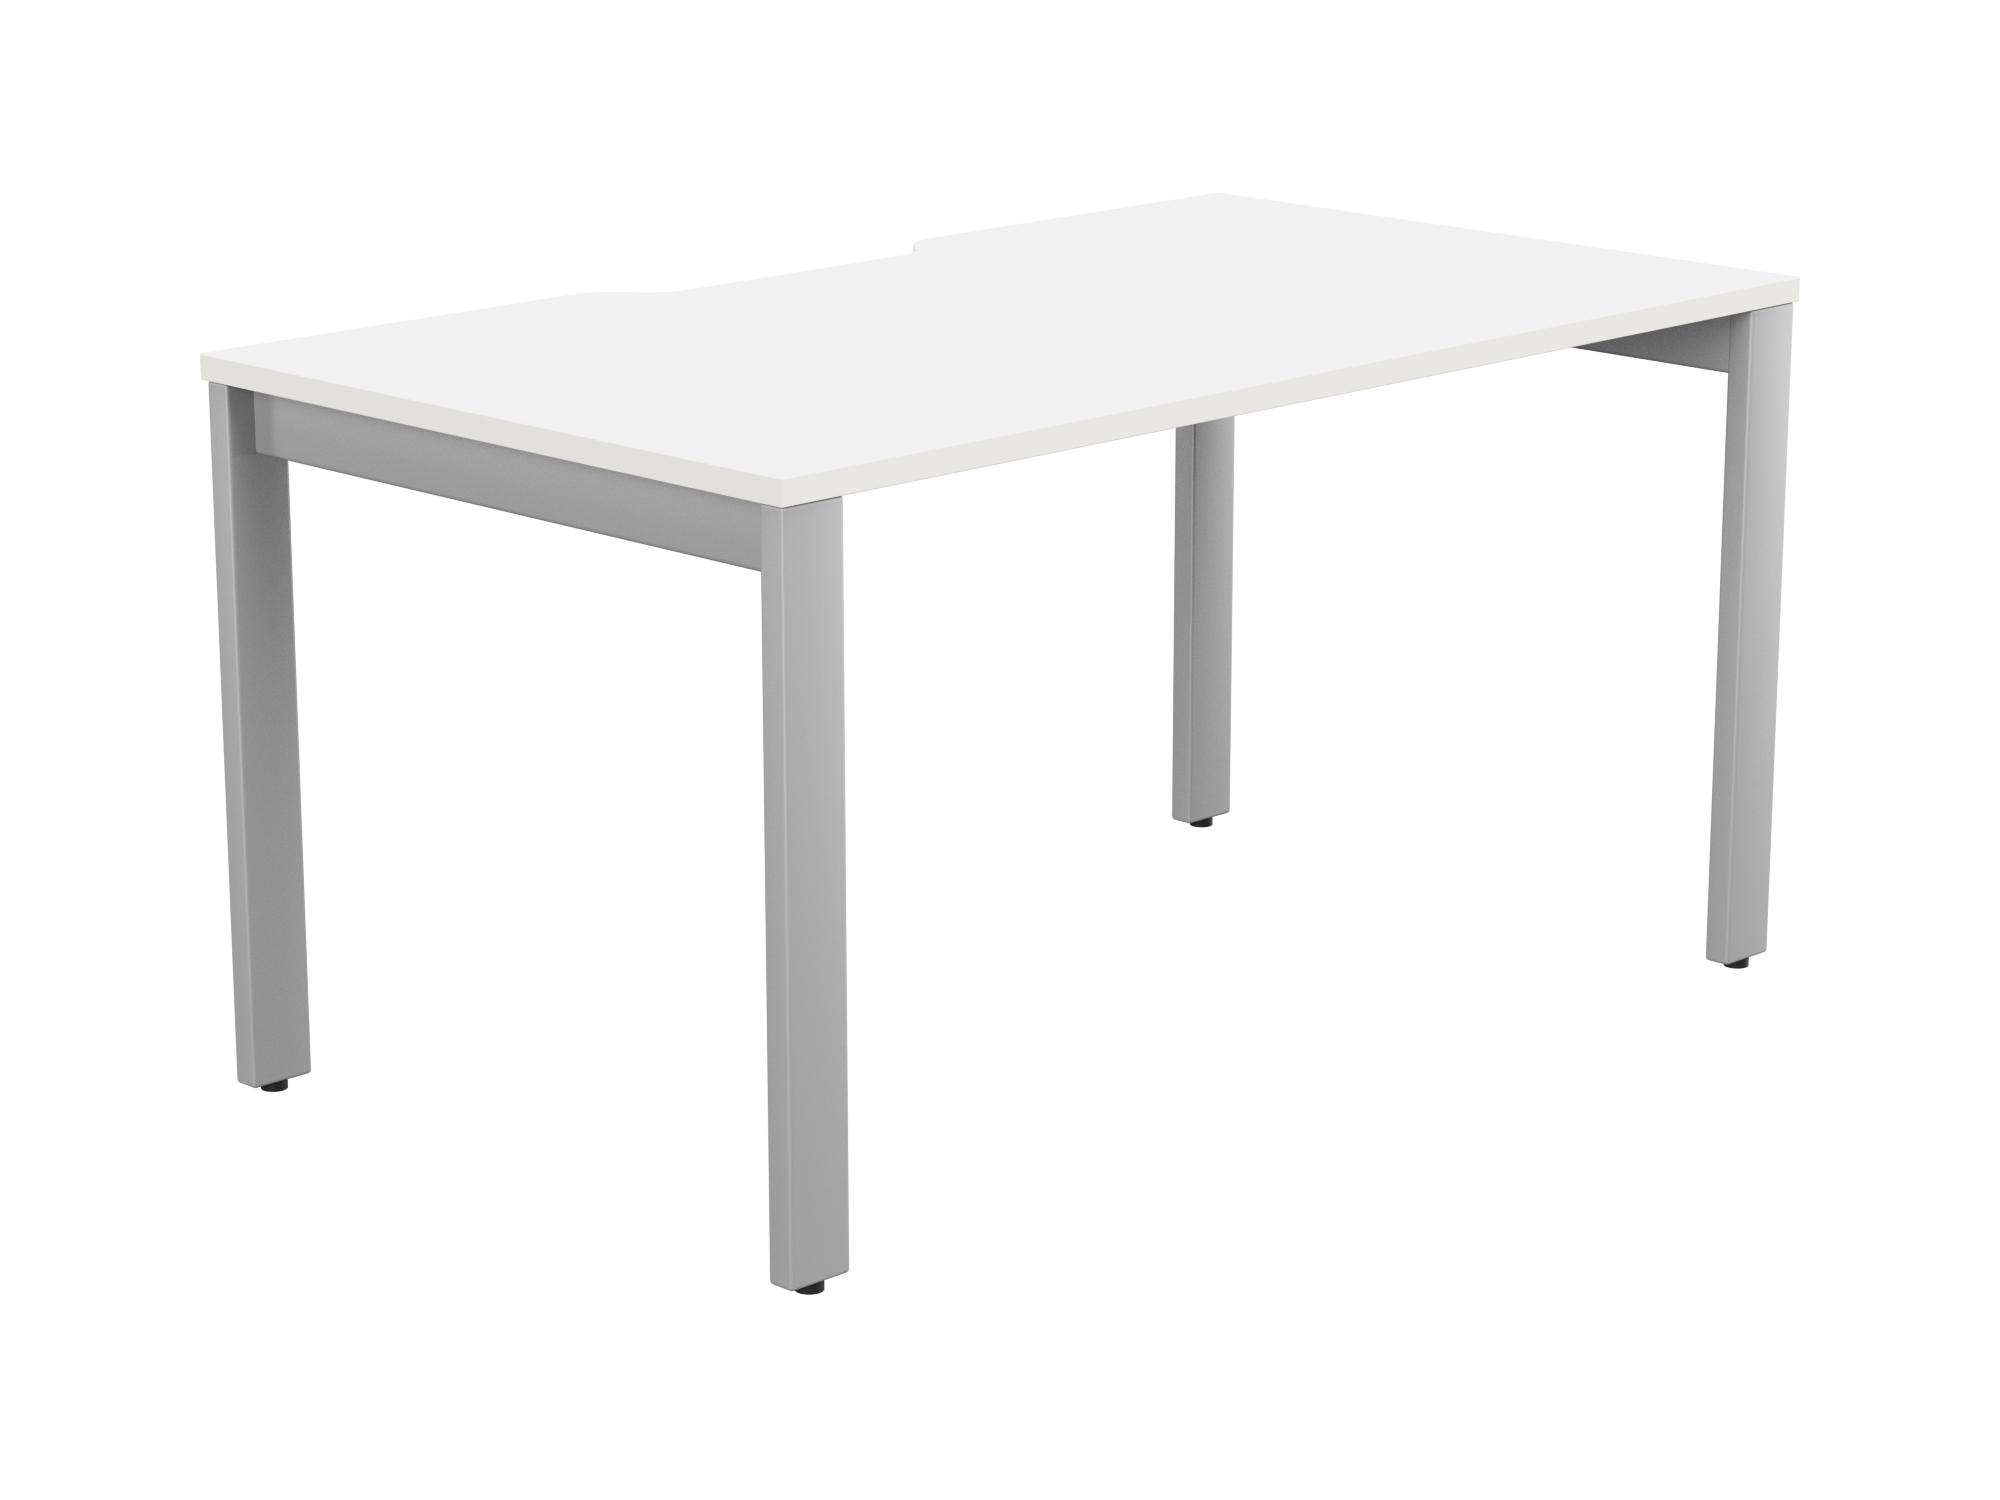 Switch 1 Person Bench Open Leg Scallop Top 1400 x 800 - Silver Frame / White Top